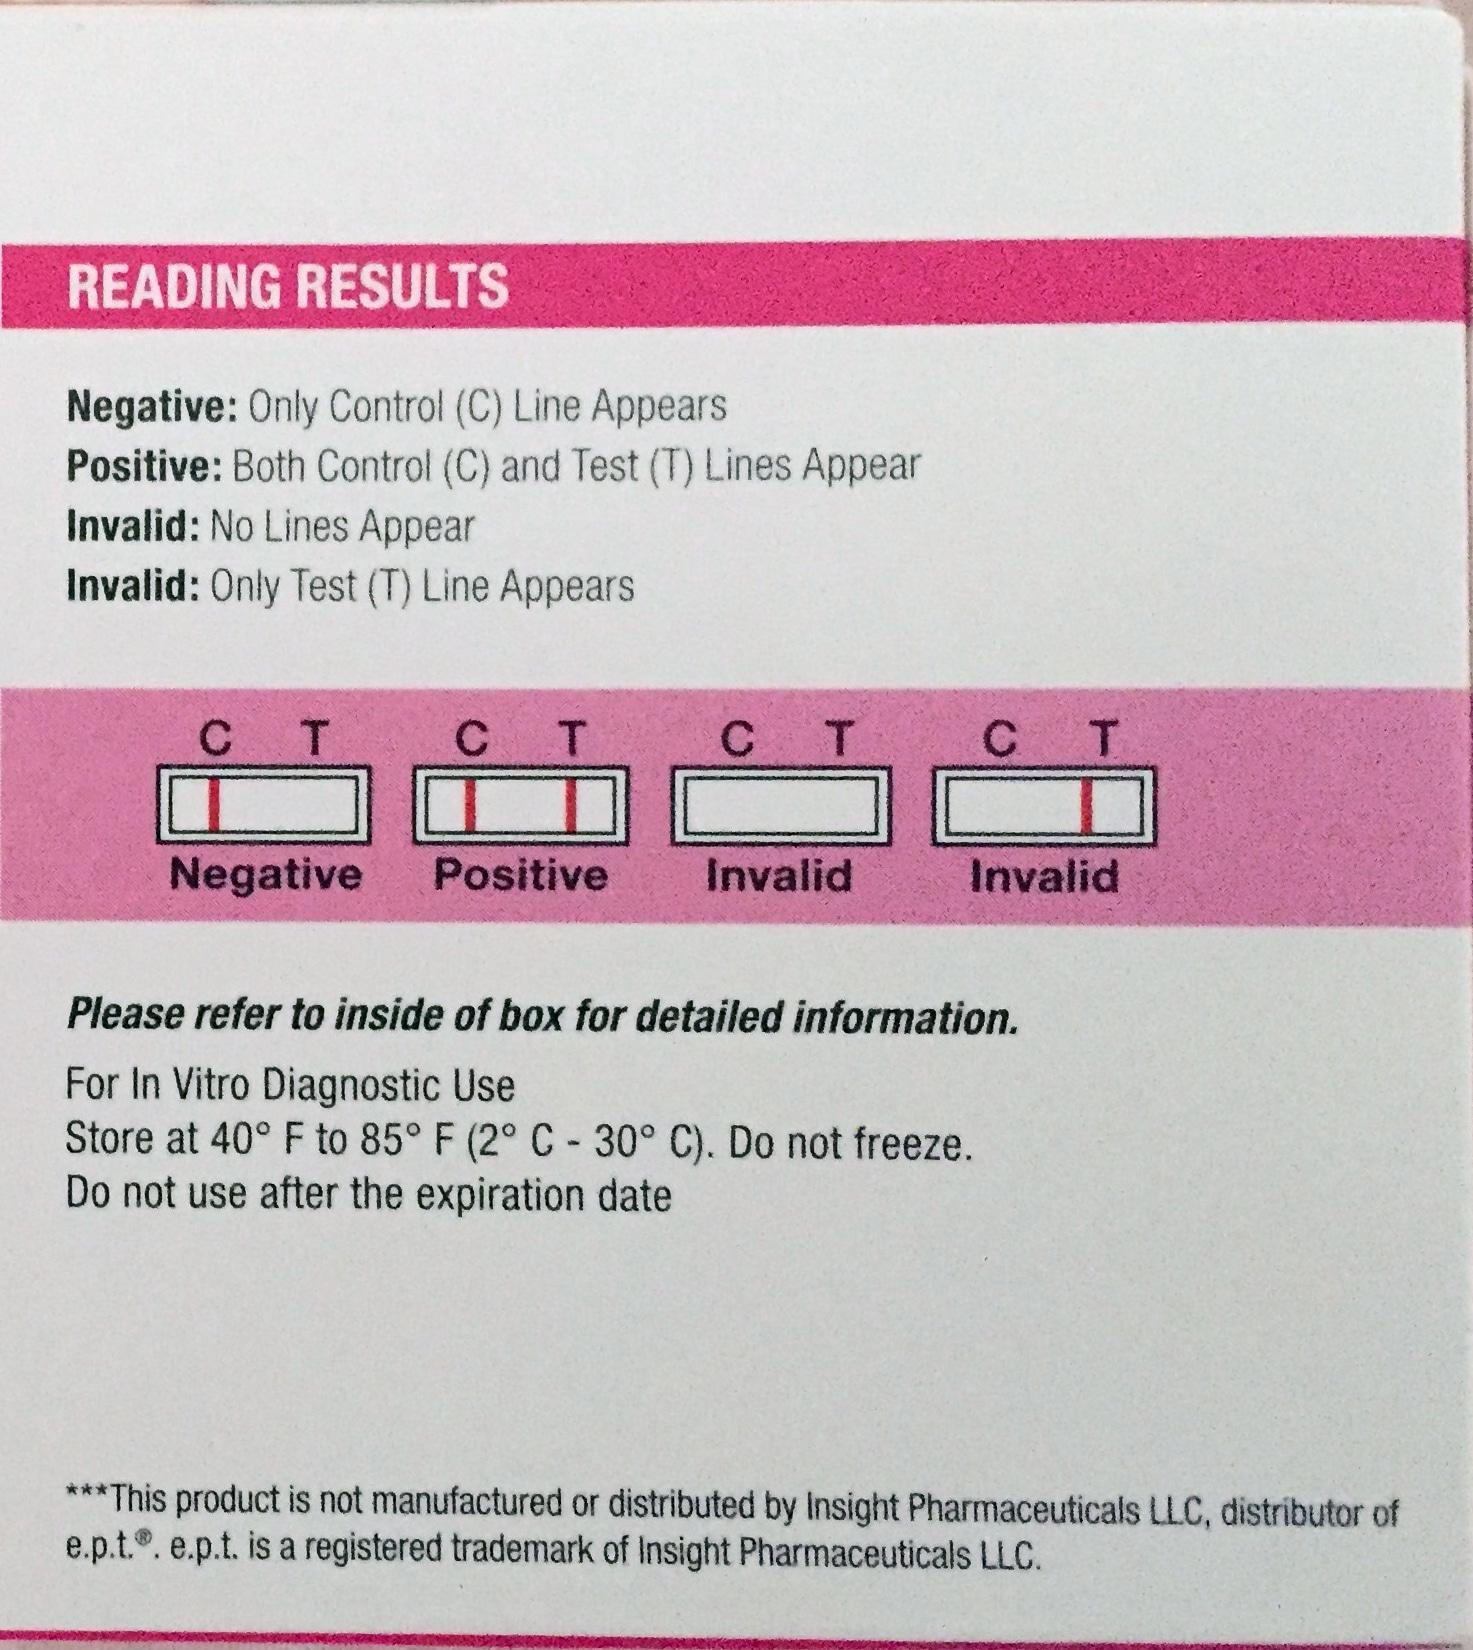 Assured Pregnancy Test results